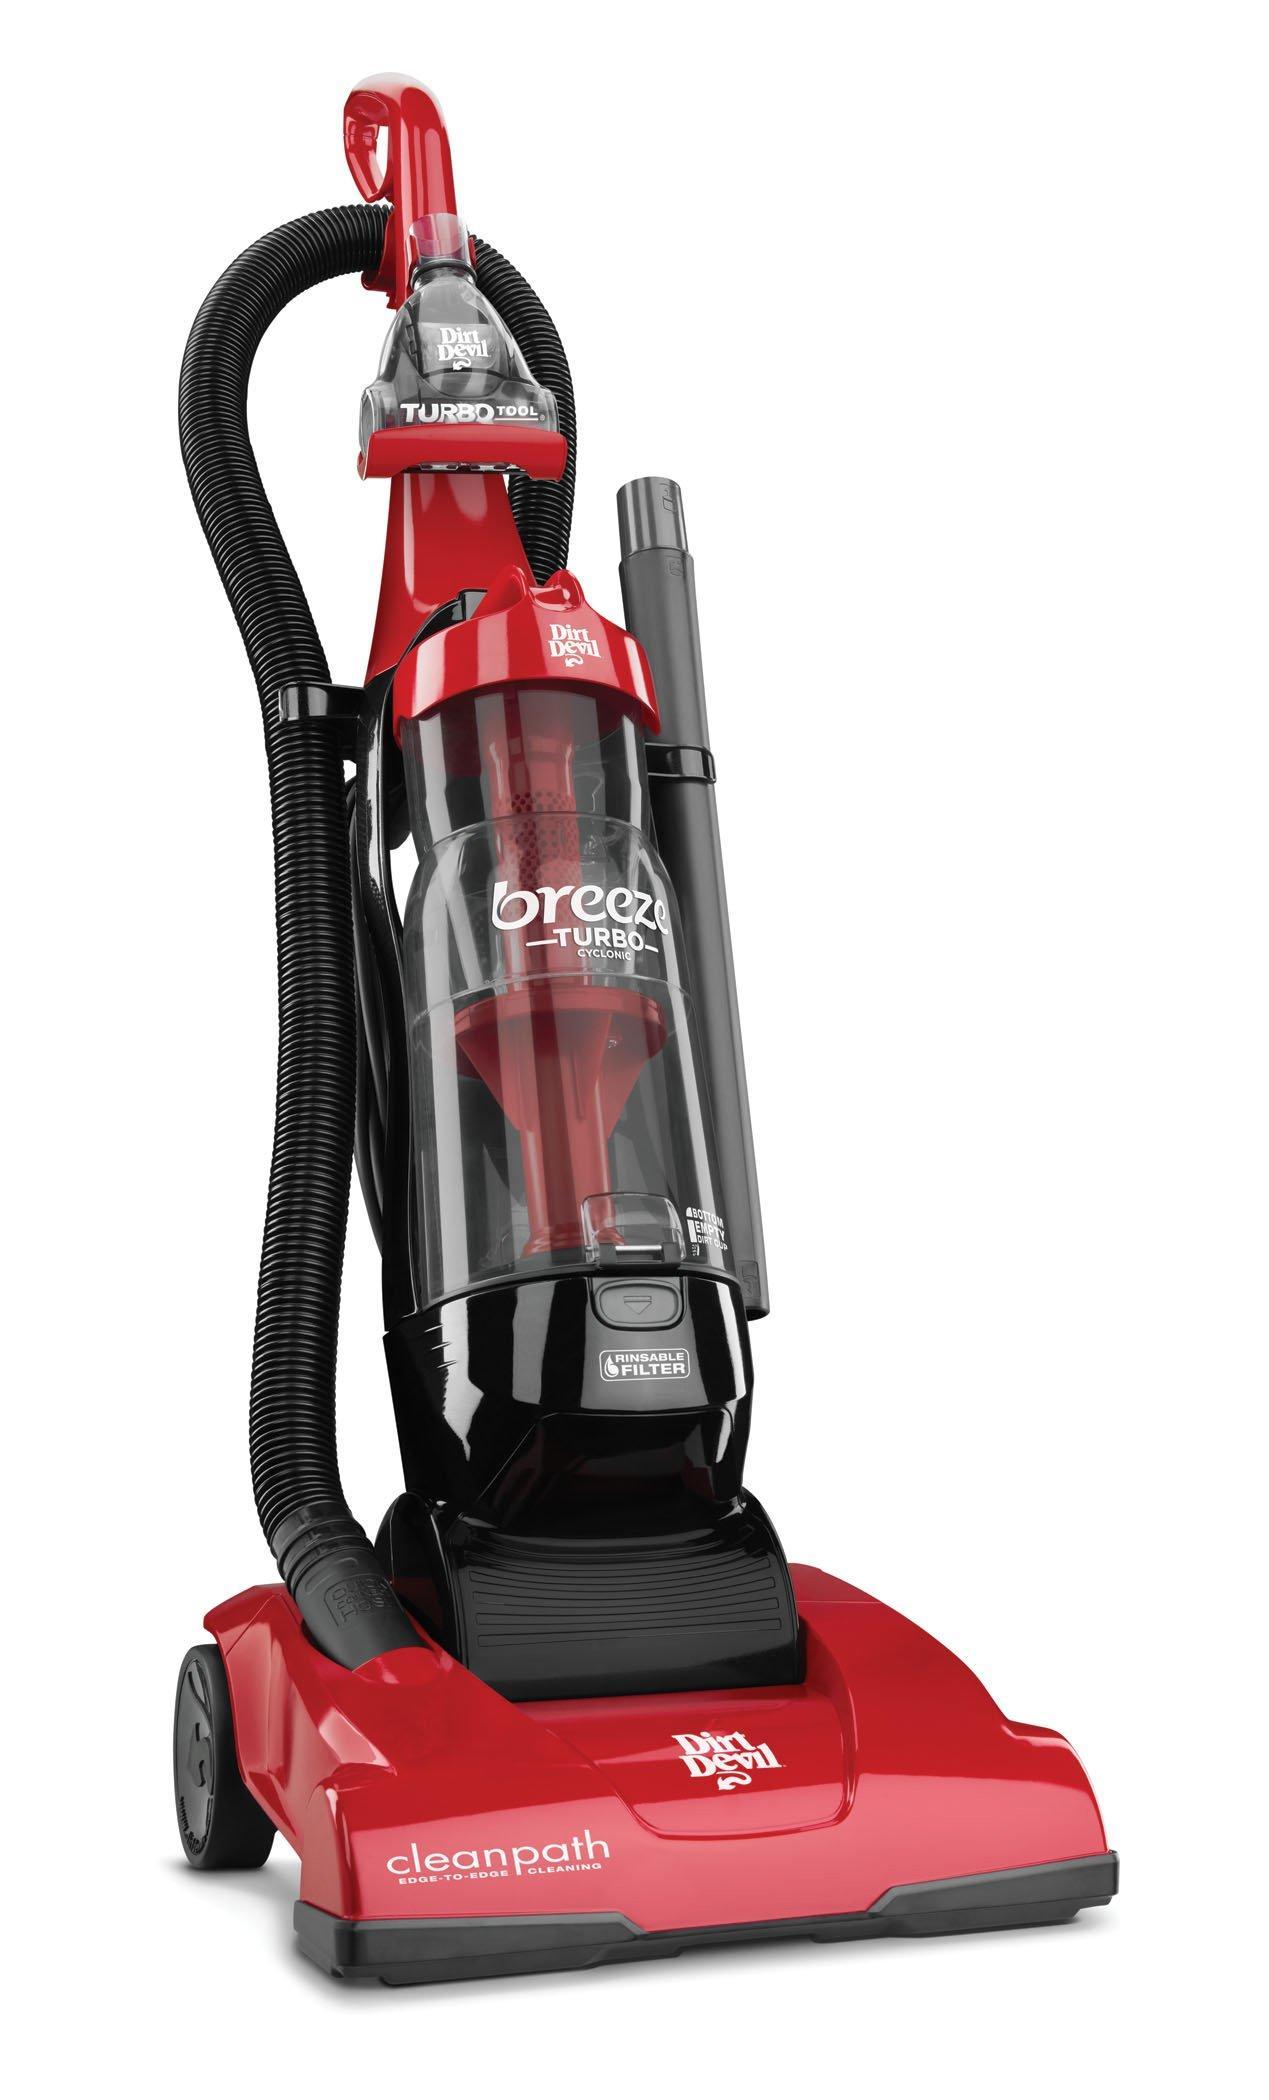 Breeze Turbo Cyclonic Upright Vacuum2